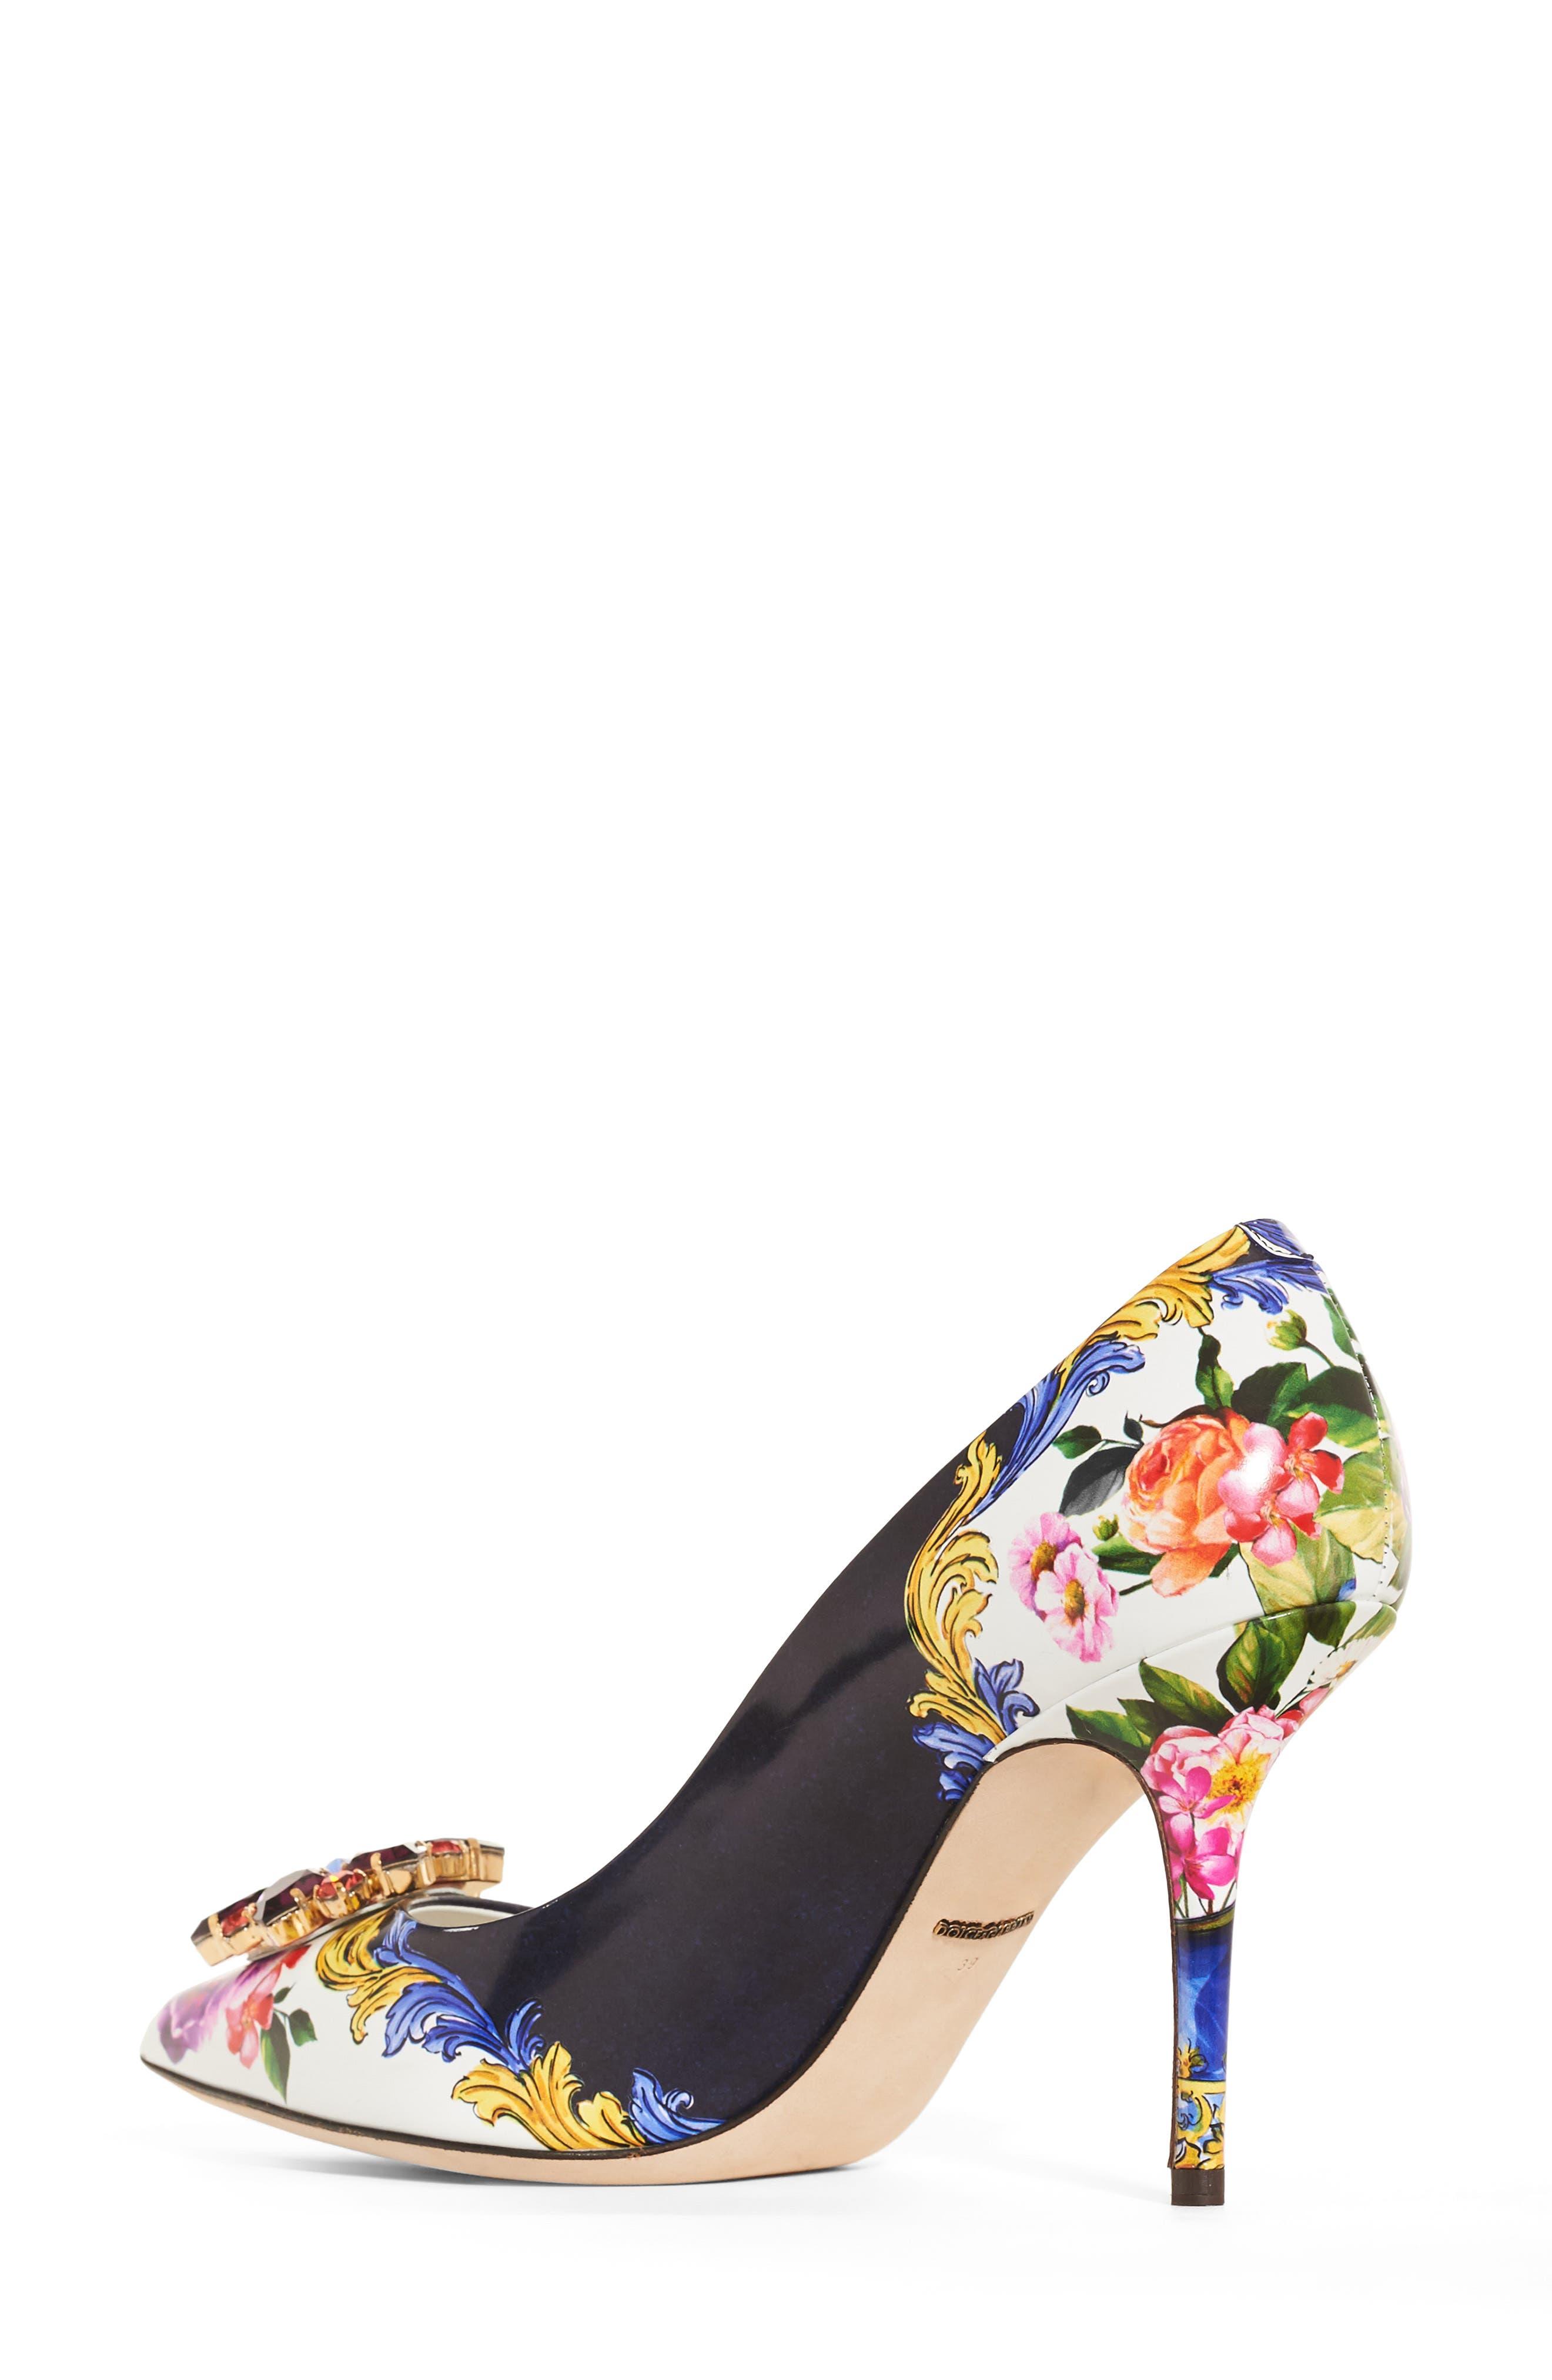 Dolce & Gabbana Print Pump,                             Alternate thumbnail 2, color,                             410